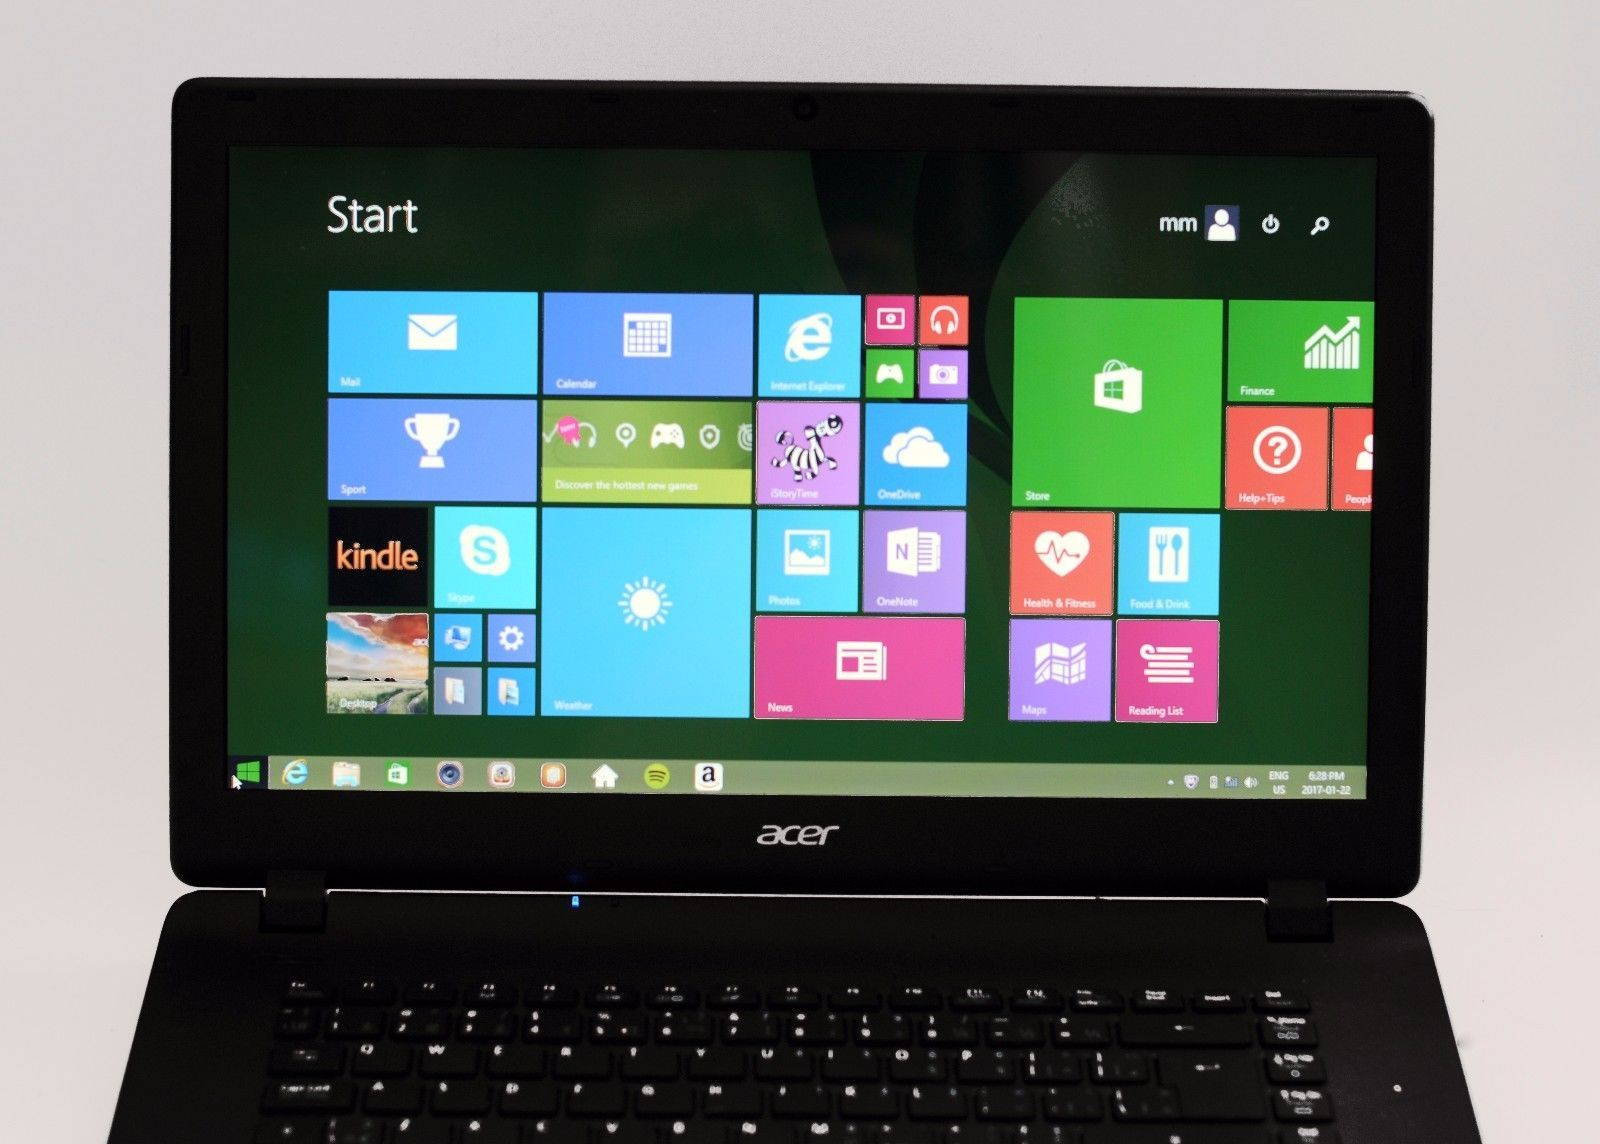 "Acer ES1-511-C35L Laptop 15.6"" Display N3530 Quad 2.16Ghz 4GB Ram Win 8.1 2014"